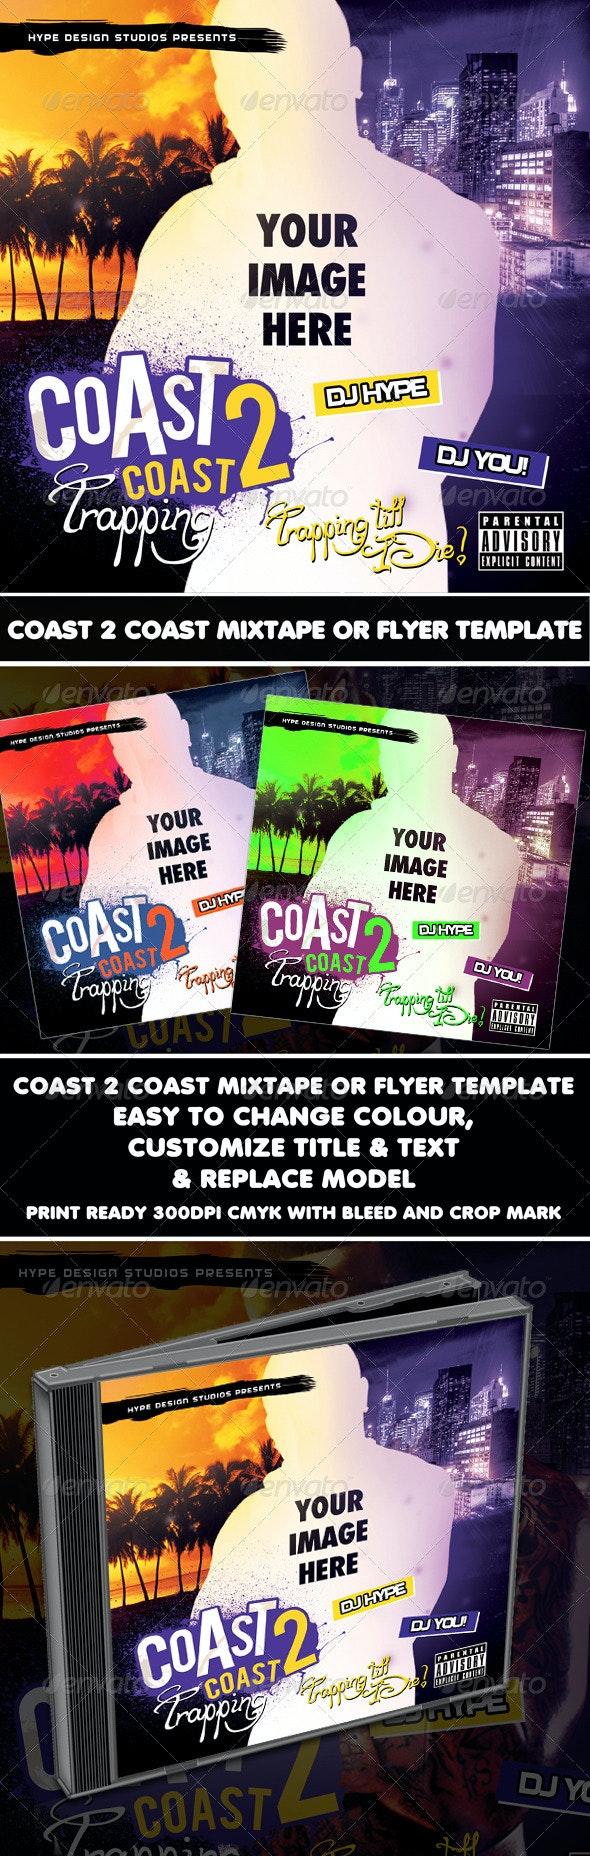 Coast 2 Coast Mixtape or Flyer Template - CD & DVD Artwork Print Templates